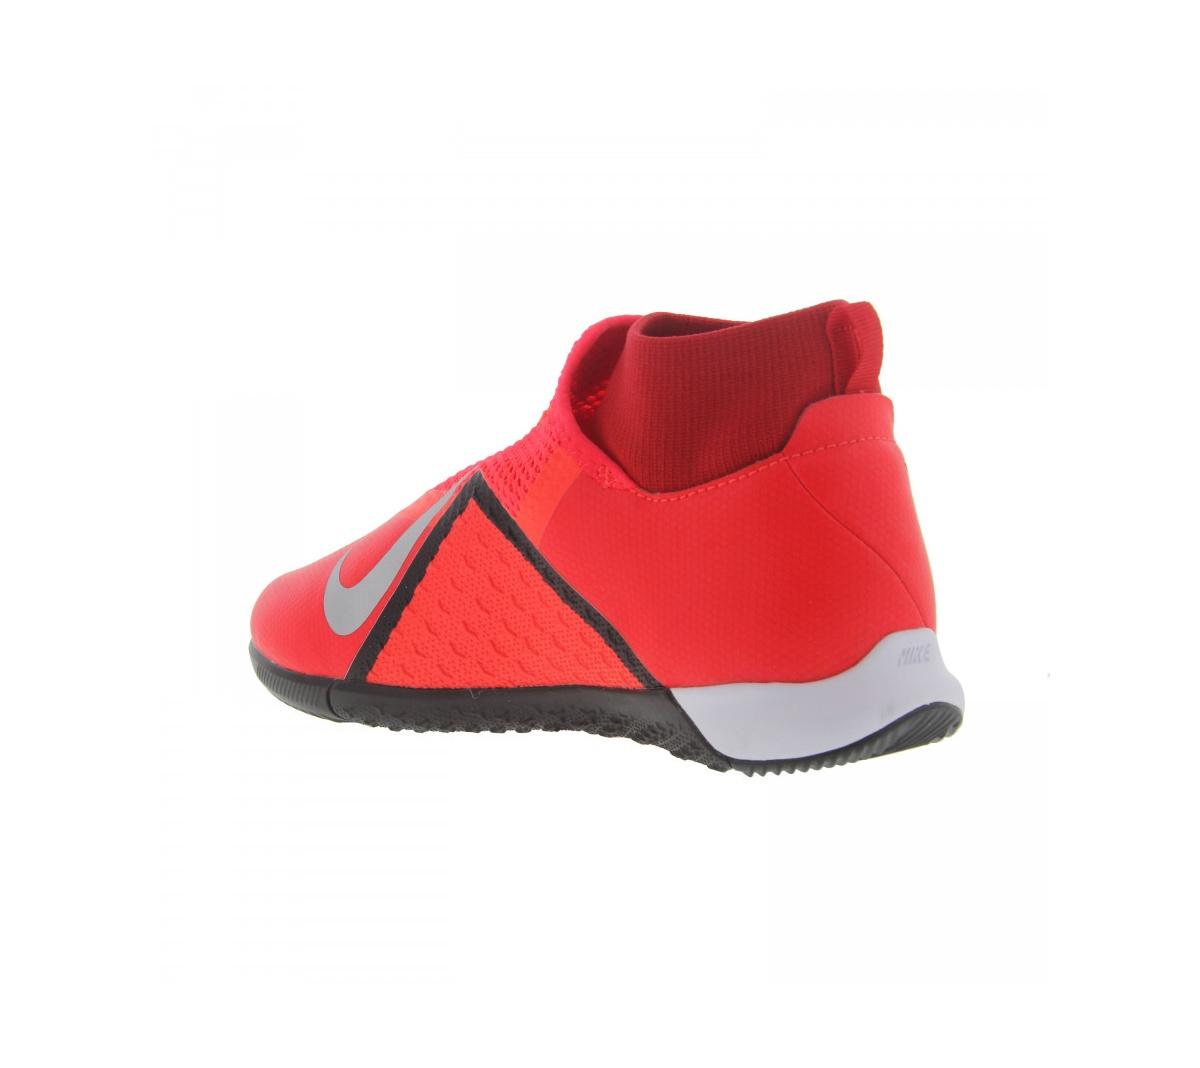 Tênis Nike Phantom VSN Academy DF Futsal Infantil